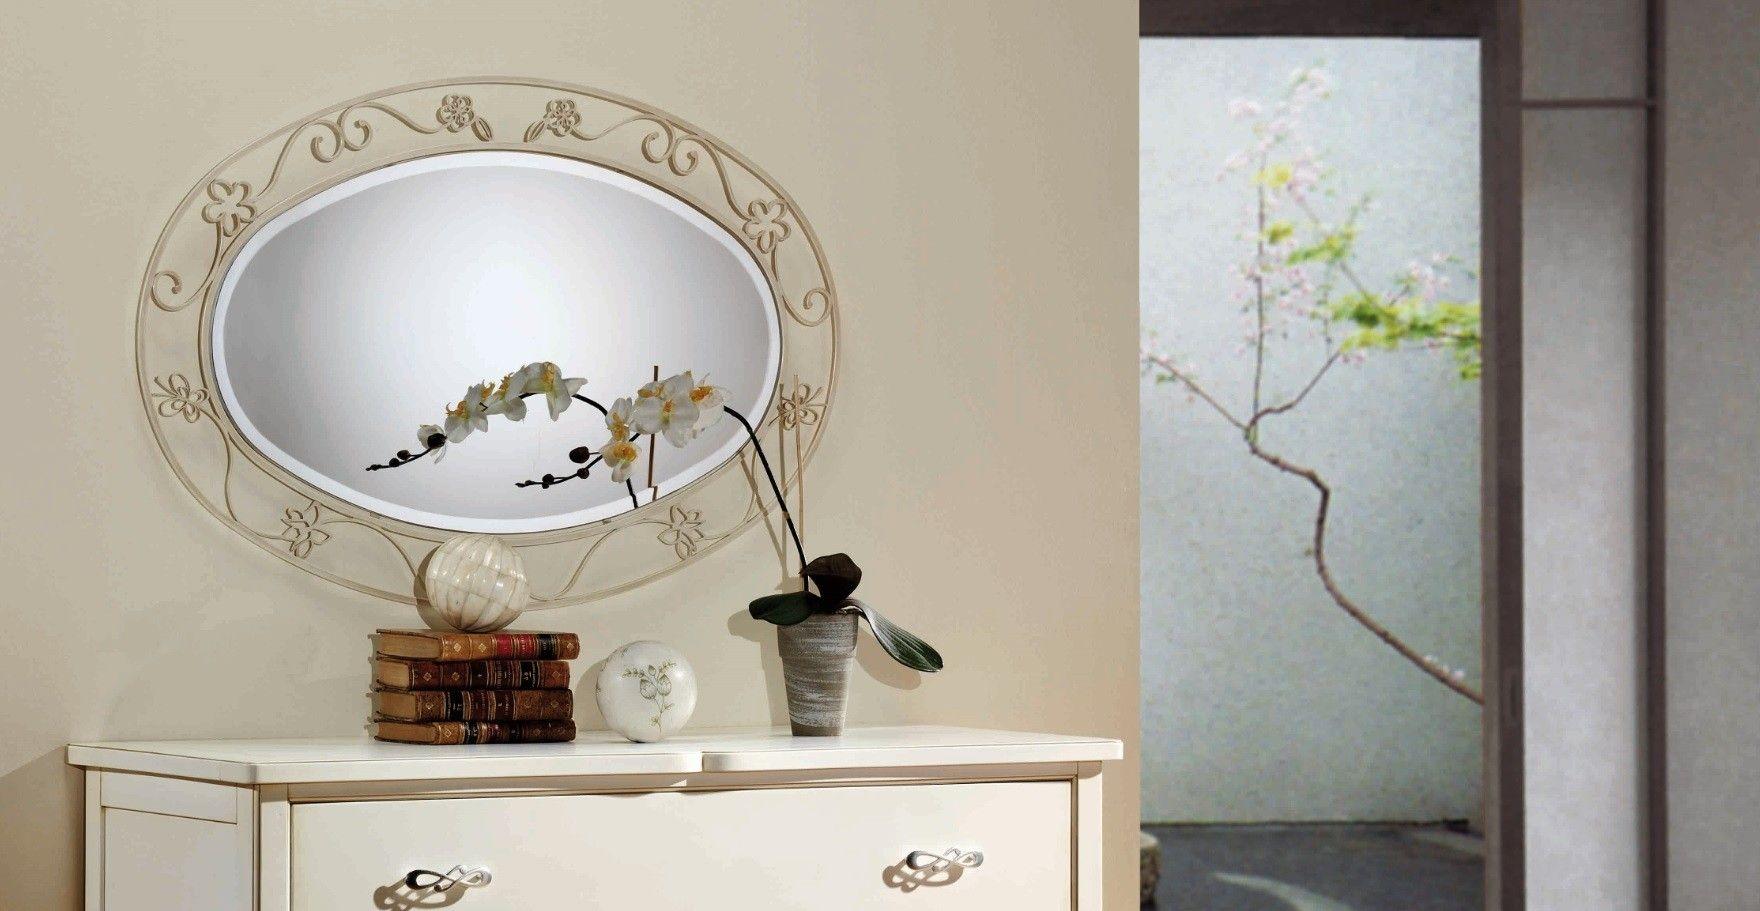 Espejo de Forja Imperia #Ambar #Muebles #Deco #Interiorismo #Espejos | http://www.ambar-muebles.com/espejo-de-forja-imperia.html